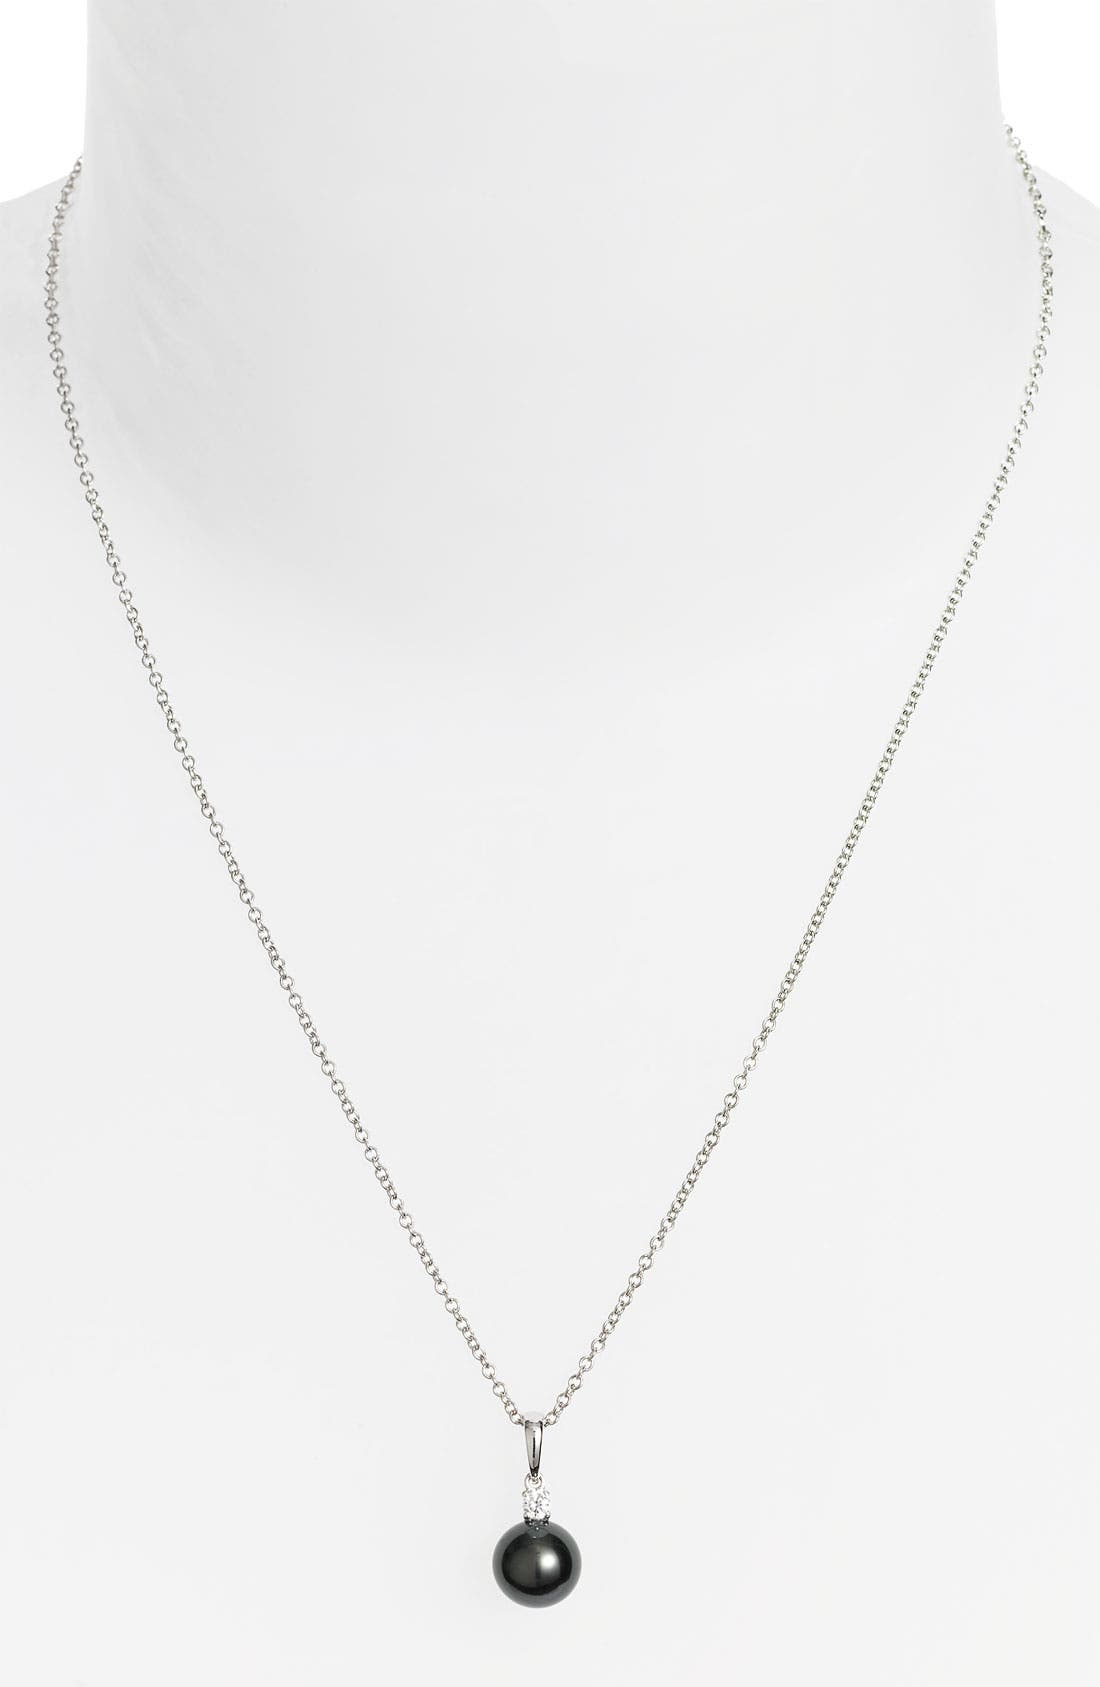 Diamond & Black South Sea Cultured Pearl Pendant Necklace